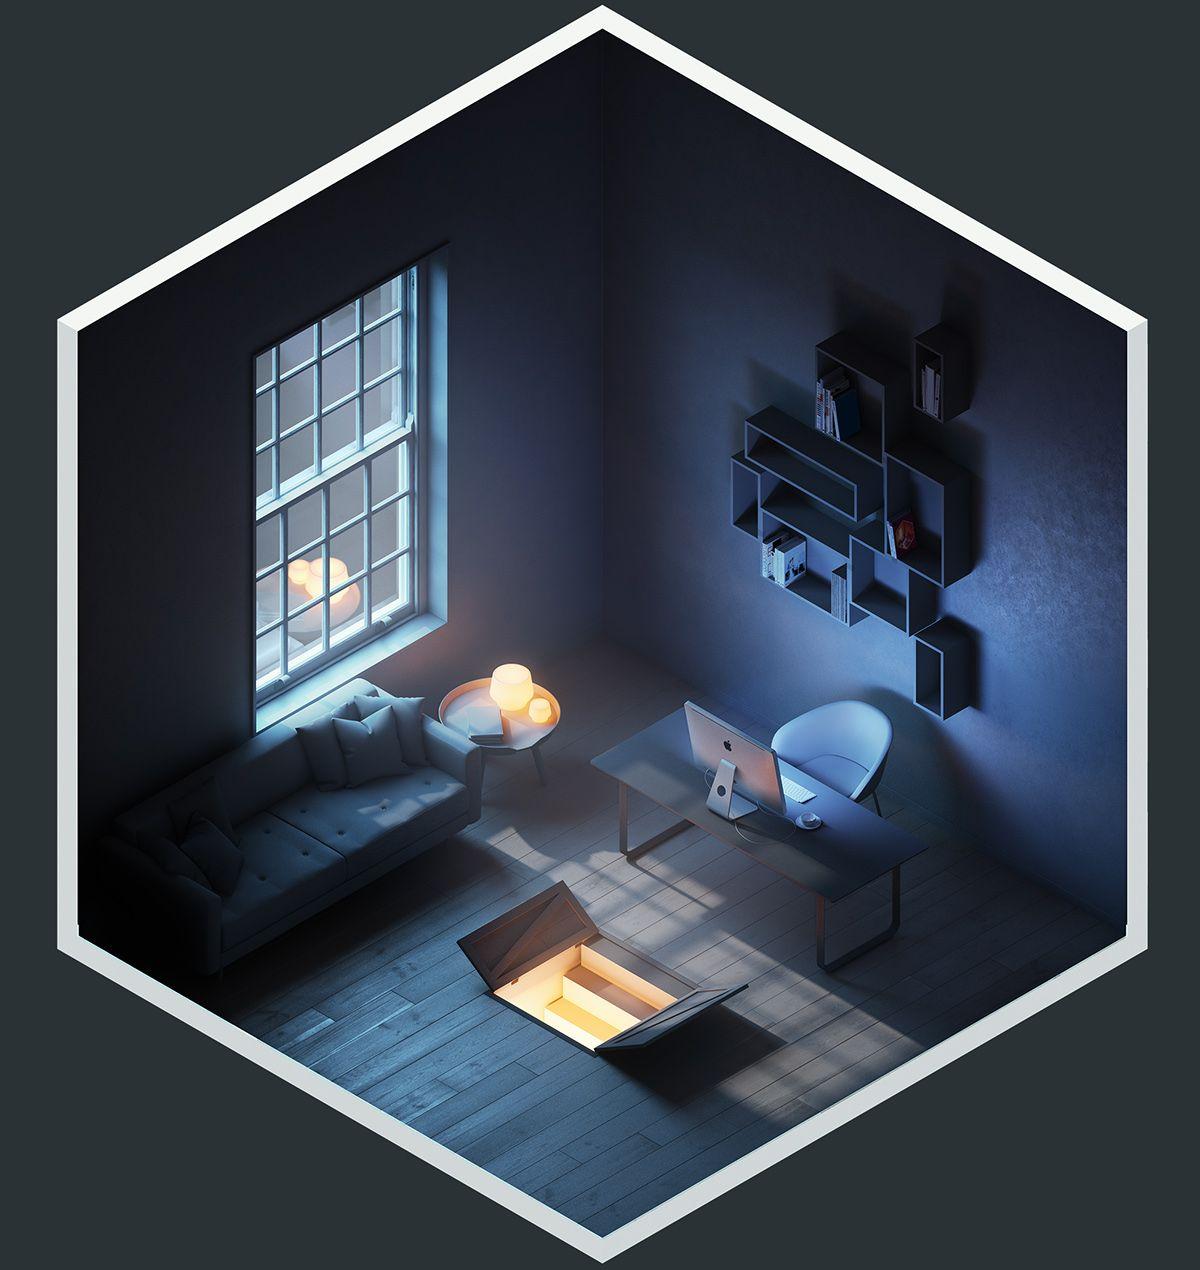 Isometric Art, Design, Room